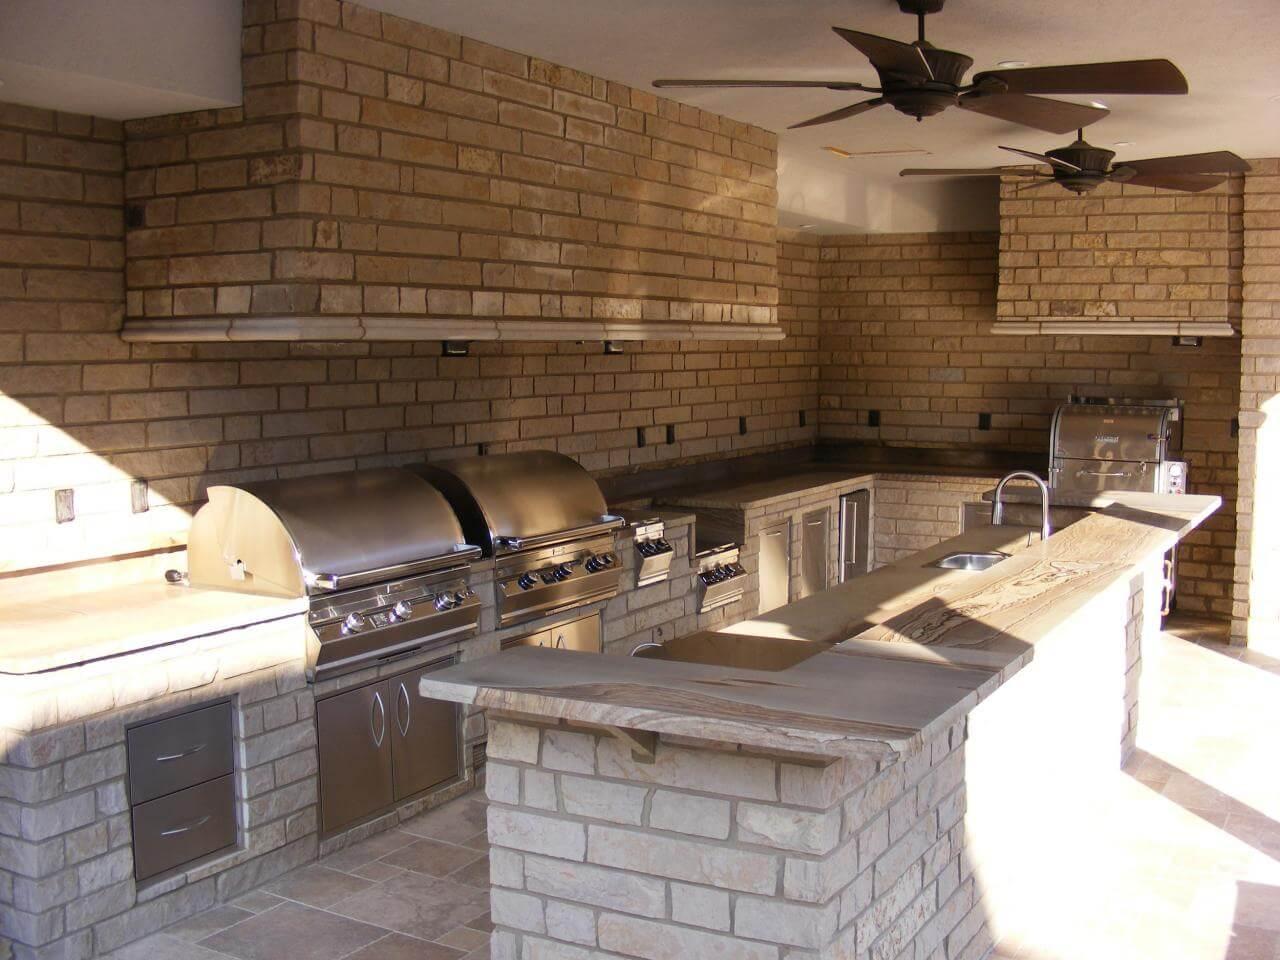 Cozy kitchen island outdoors